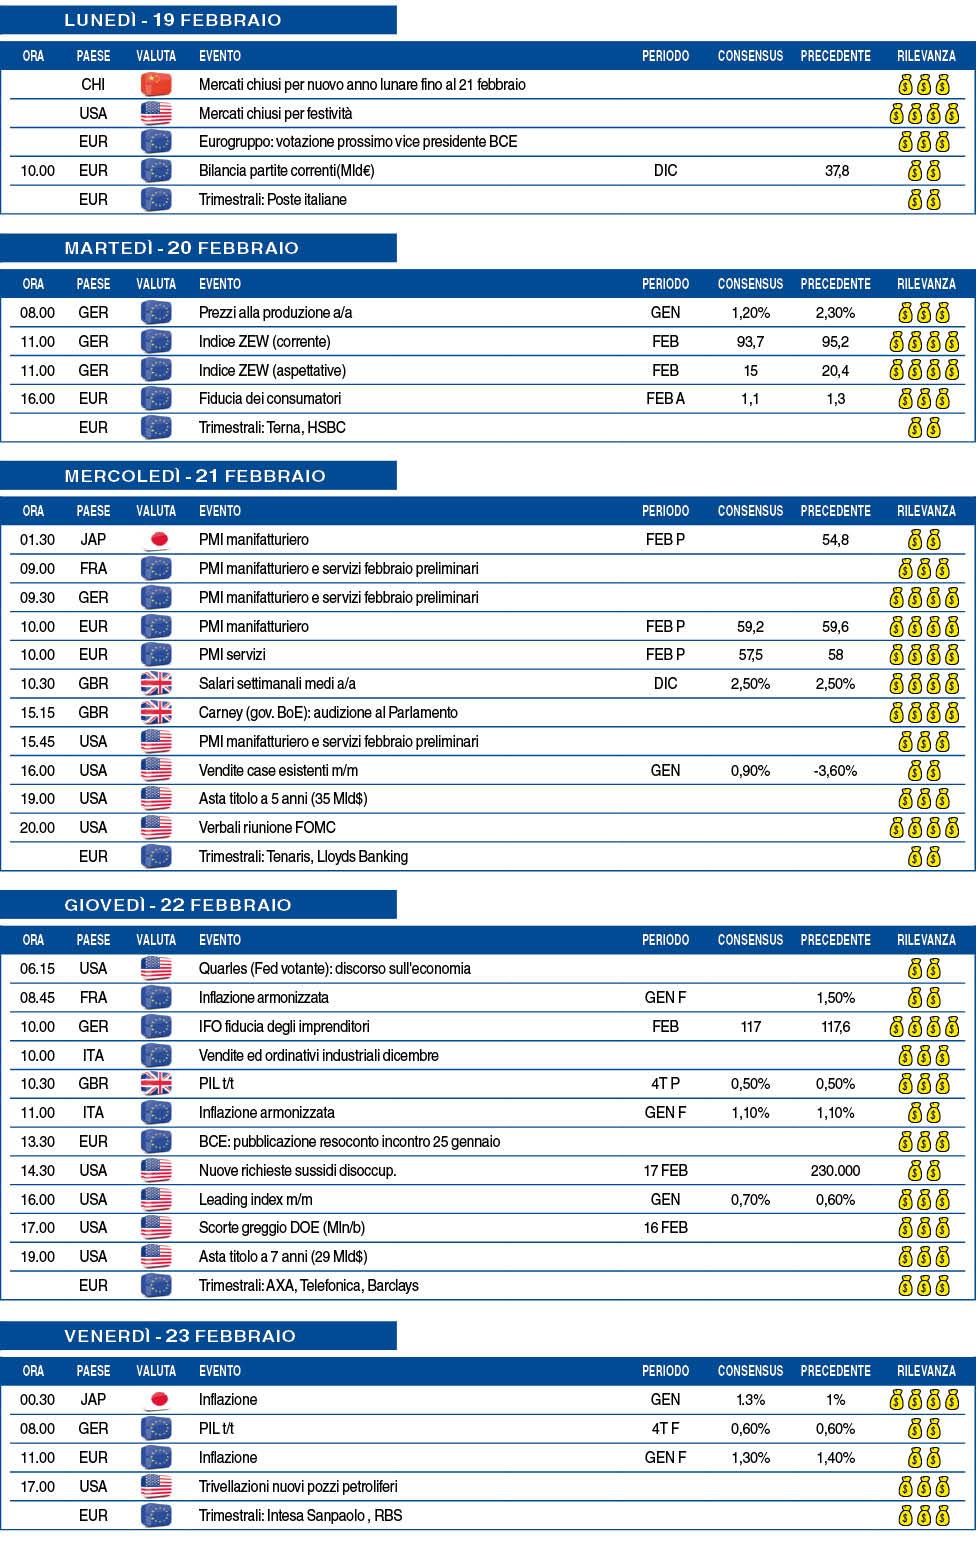 Calendario Asta Btp.Calendario Macro Della Settimana Dal 19 Al 23 Febbraio